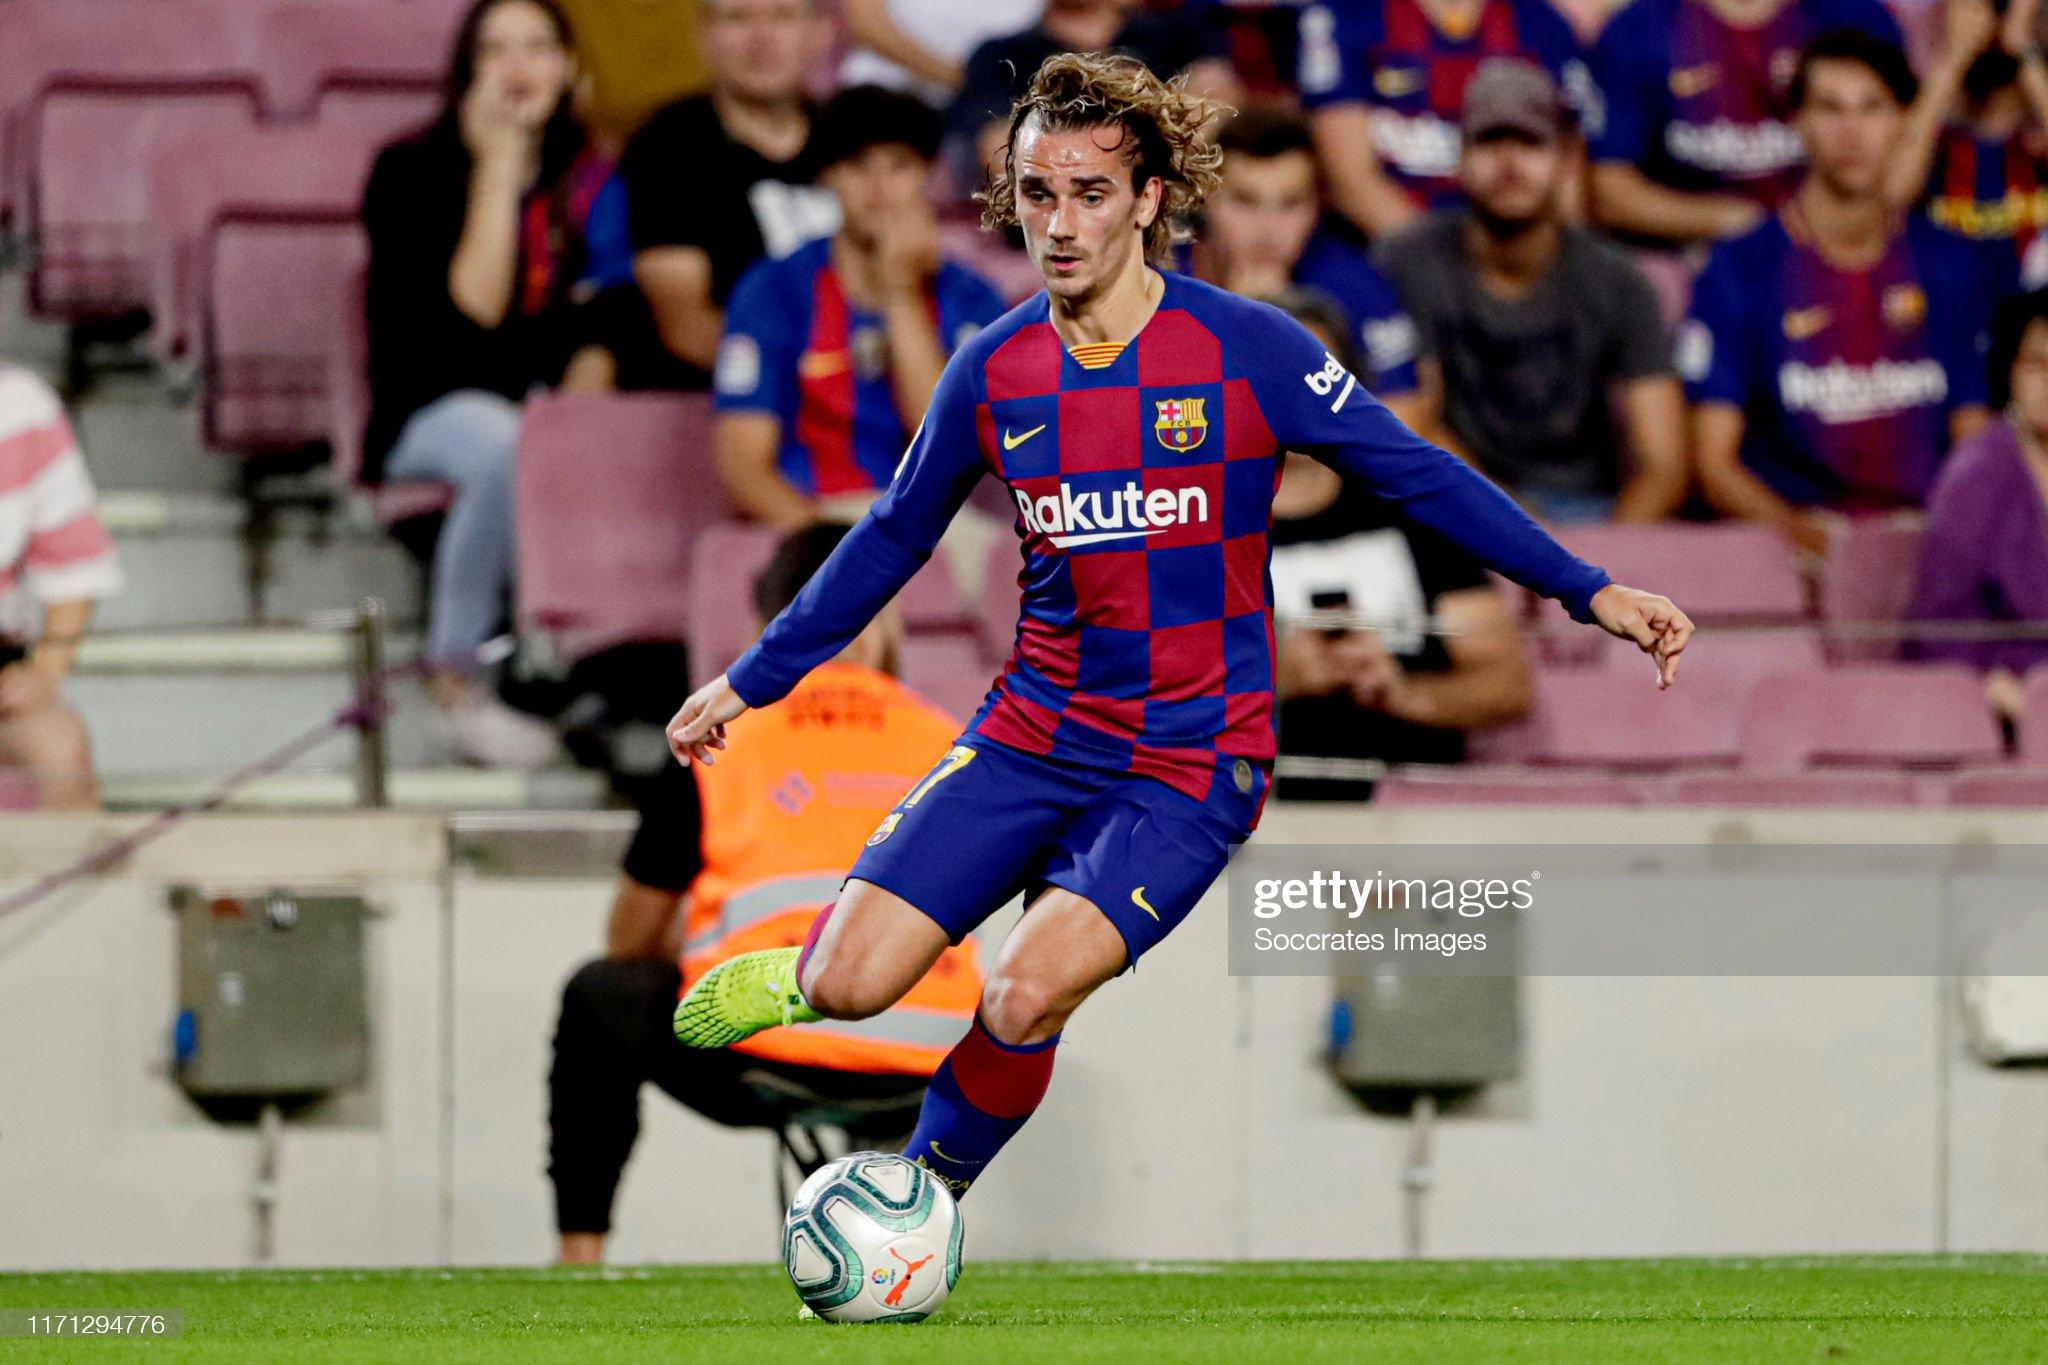 صور مباراة : برشلونة - فياريال 2-1 ( 24-09-2019 )  Antoine-griezmann-of-fc-barcelona-during-the-la-liga-santander-match-picture-id1171294776?s=2048x2048